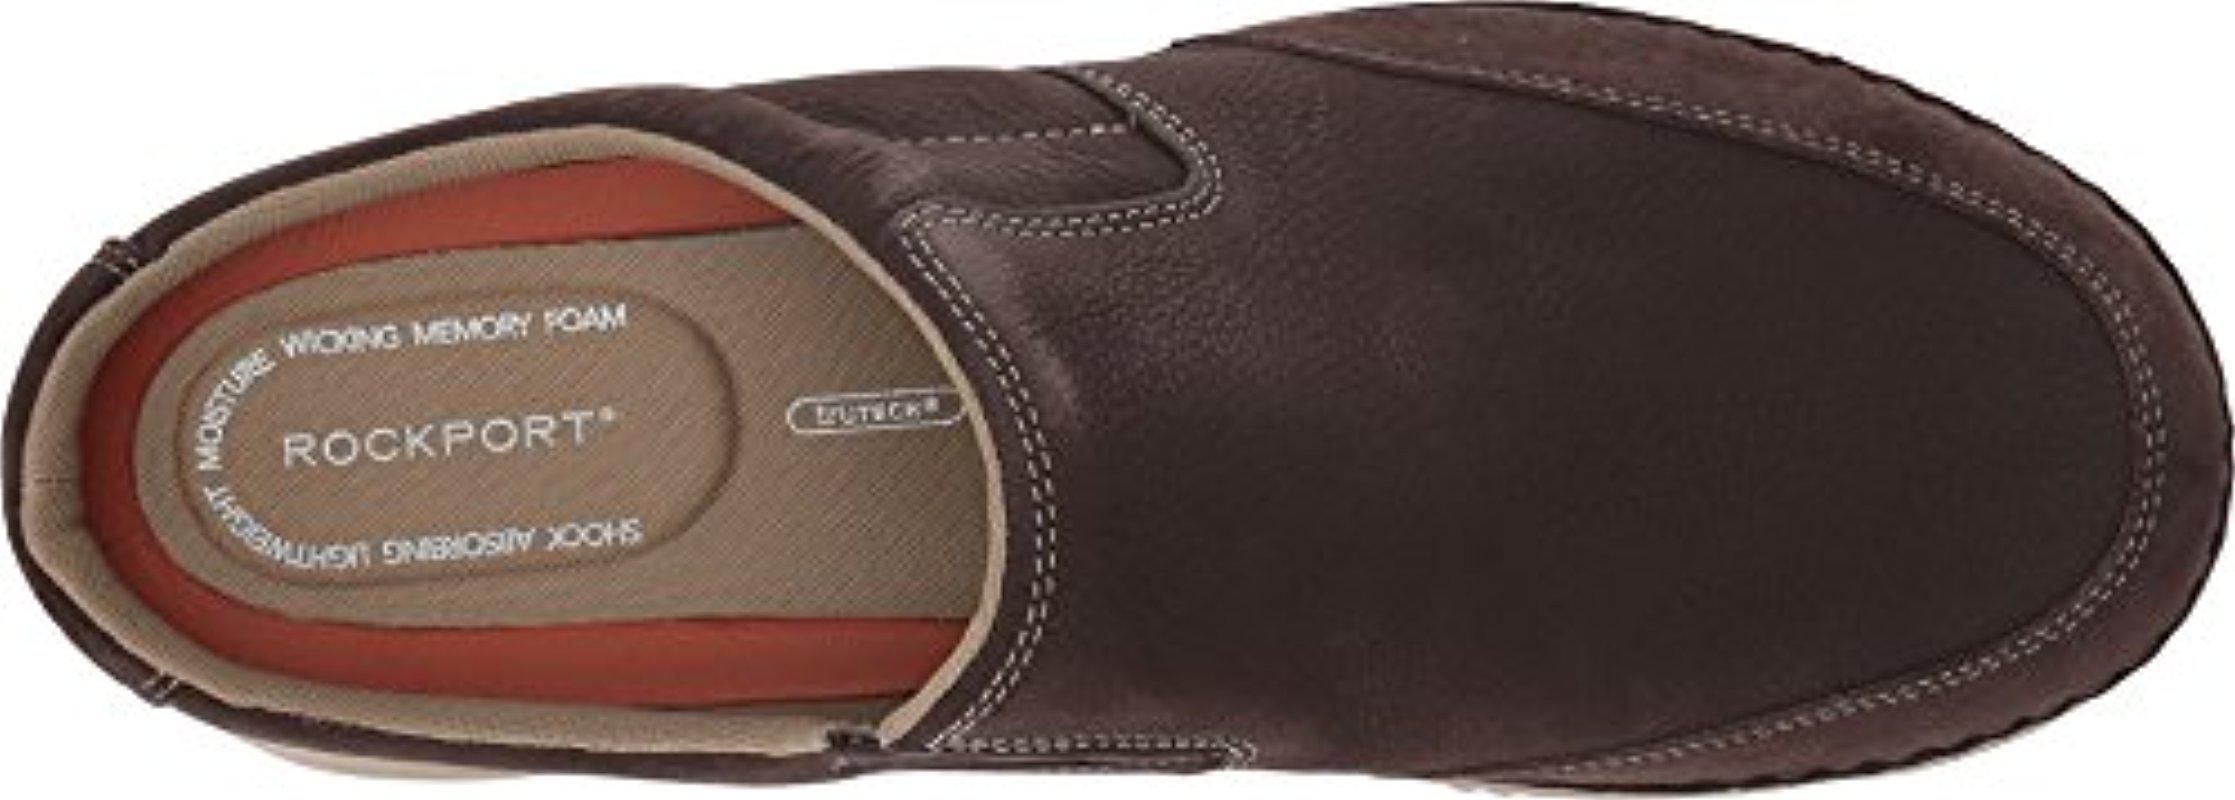 Rockport Men/'s RocSports Lite Five Clog Shoe